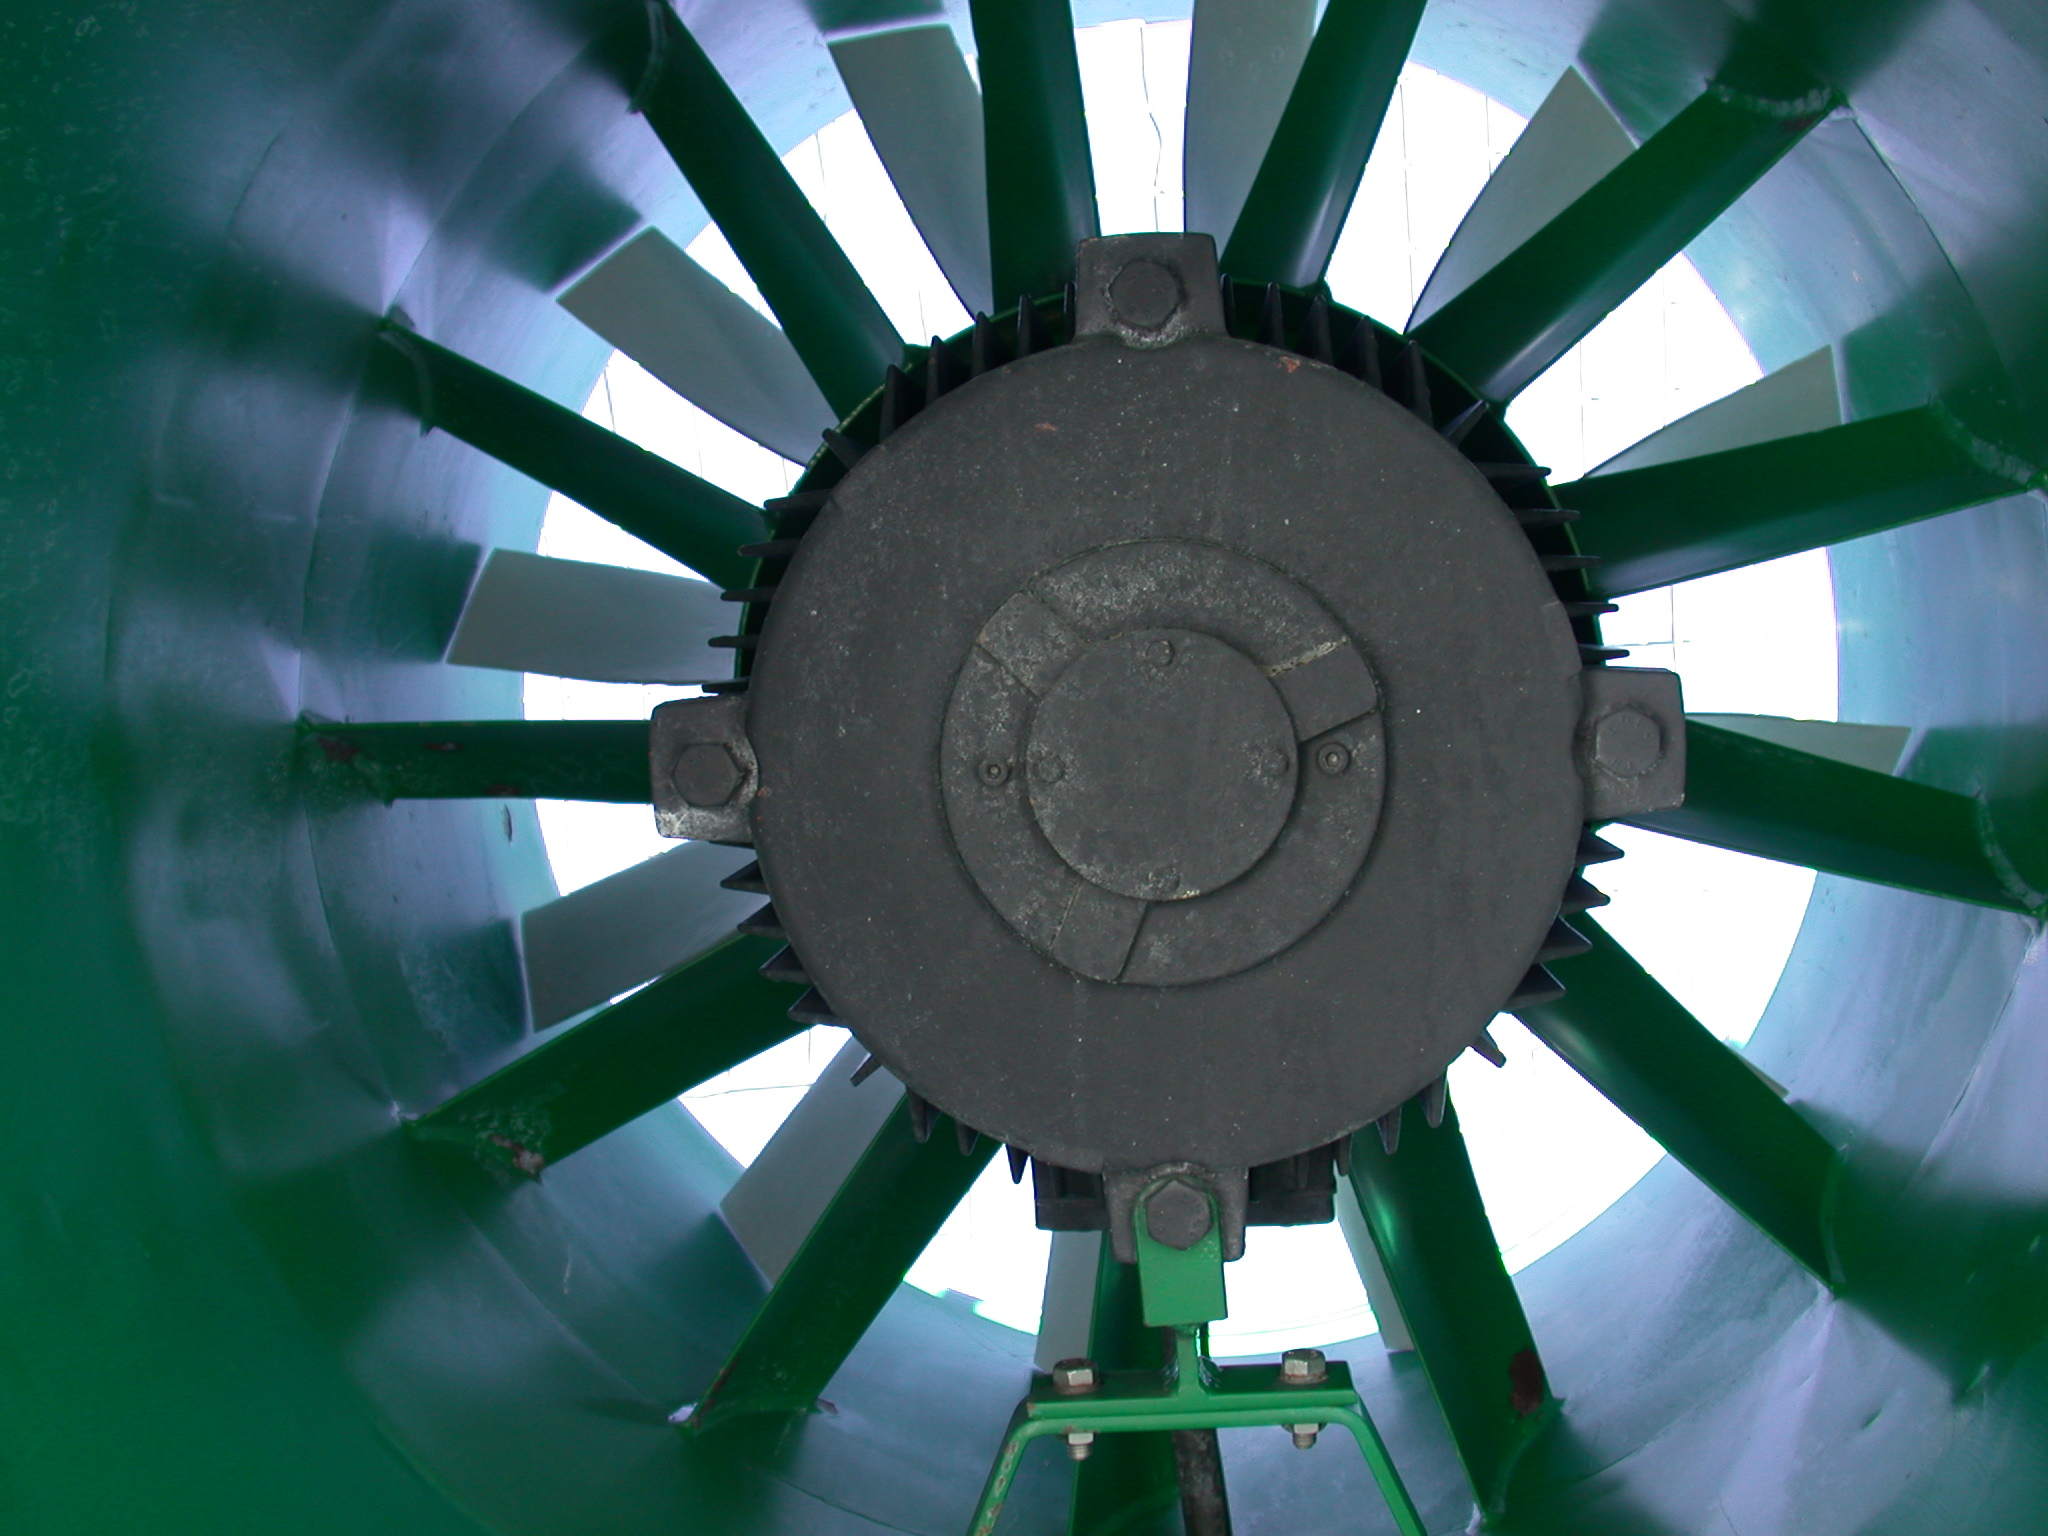 mechanics fan blade blades circle engine cooling turbofan jetengine